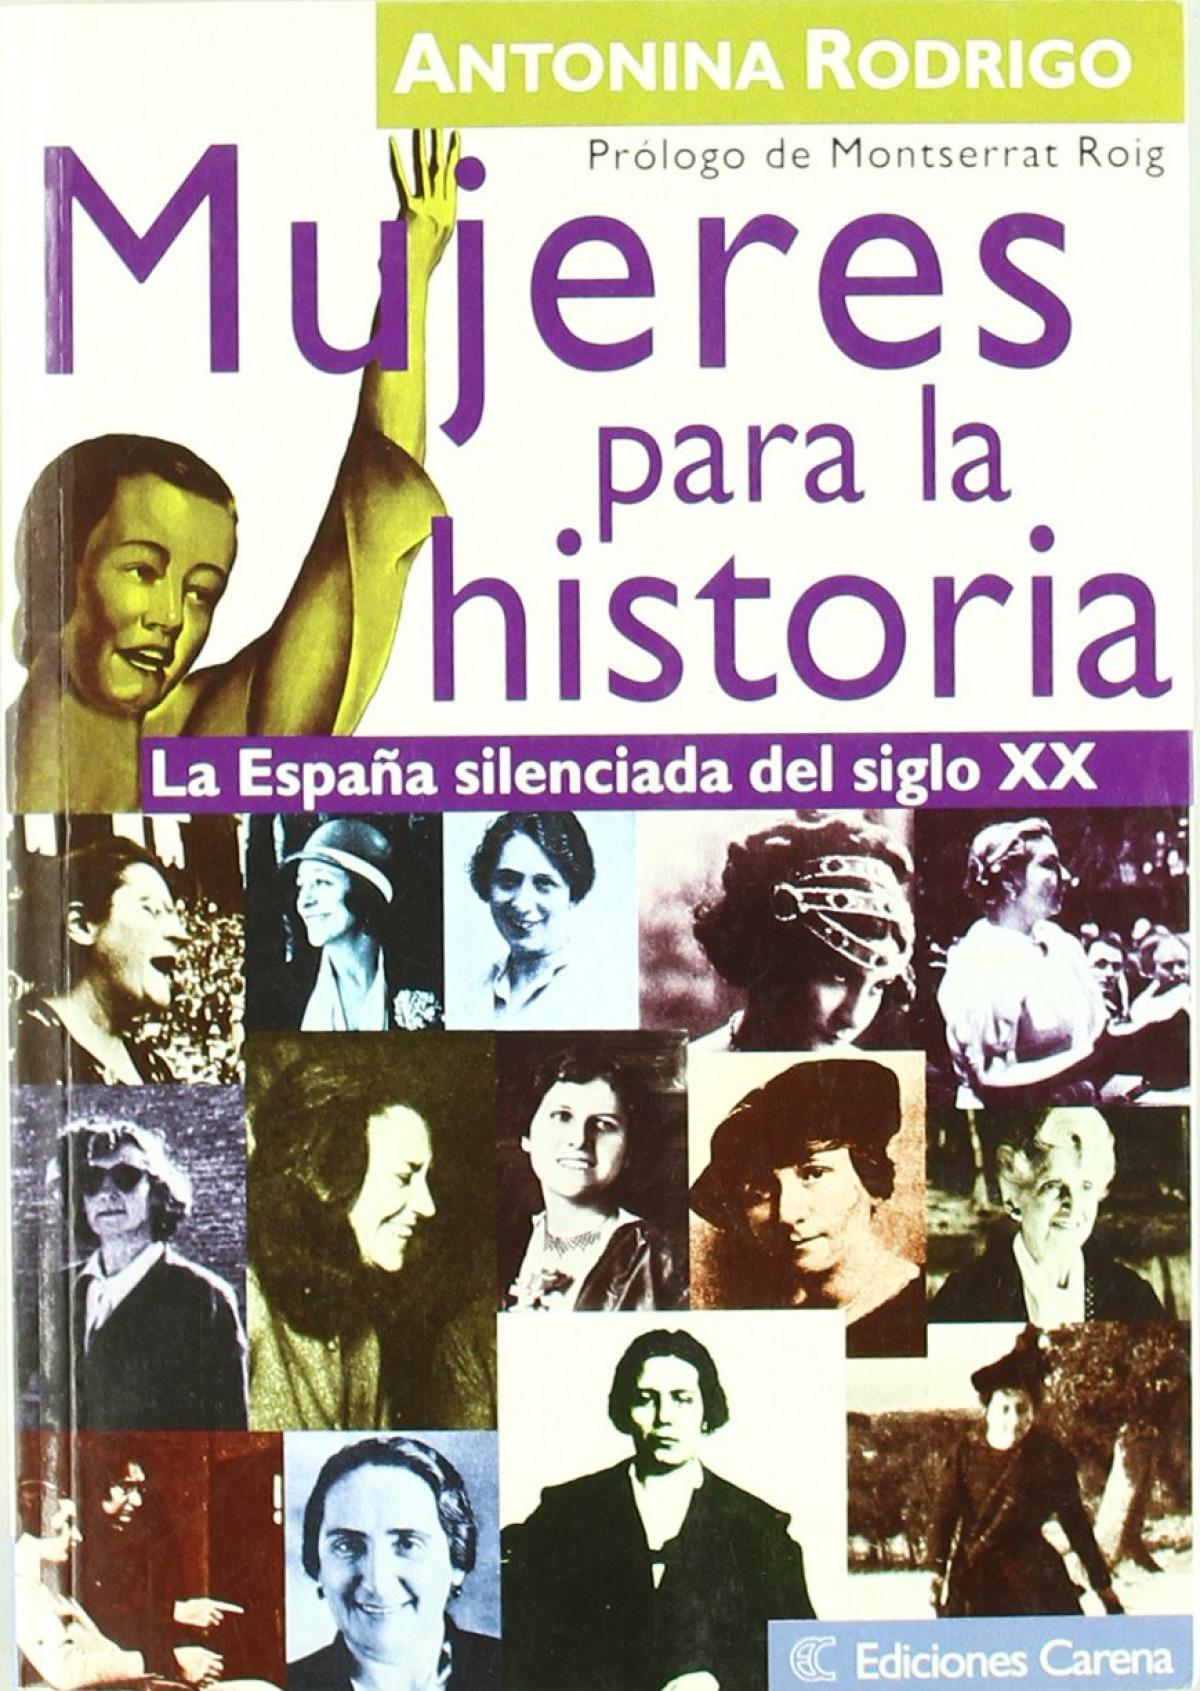 Mujeres para la historia:España silenciada siglo XX 9788488944955